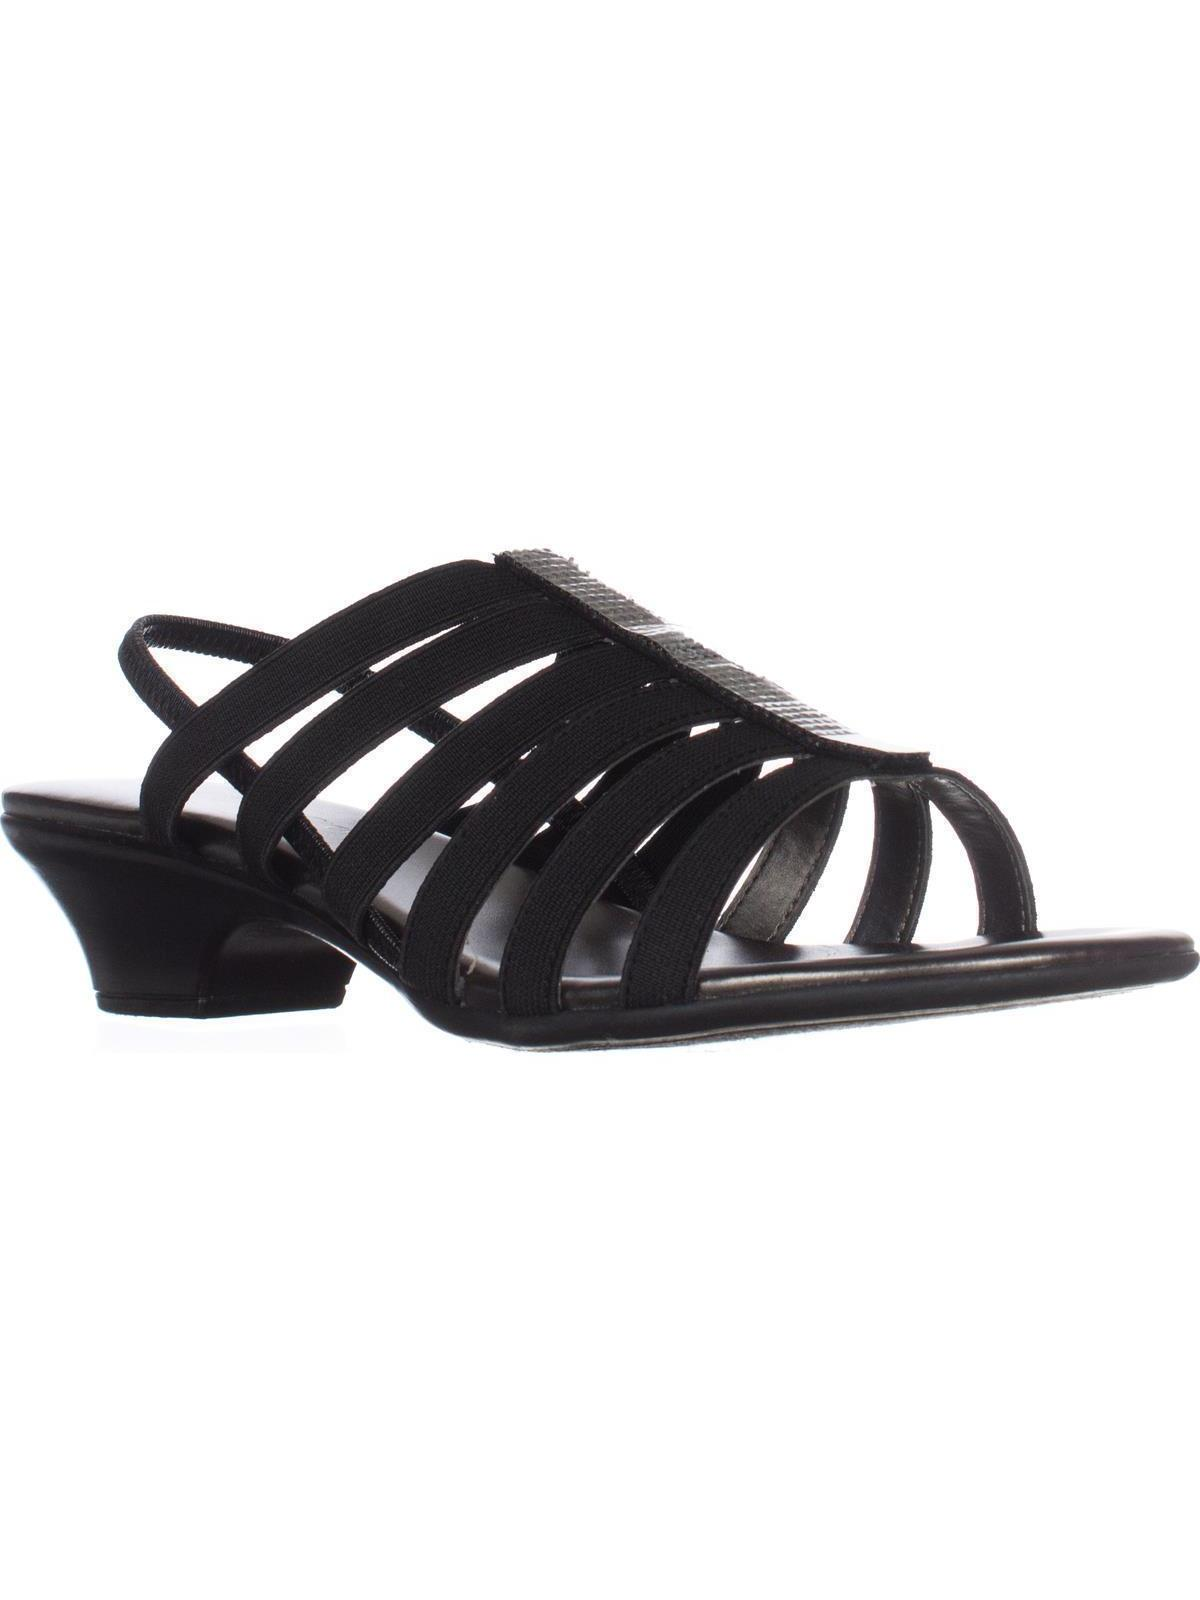 Womens KS35 Estevee Strappy Slingback Sandals, Black